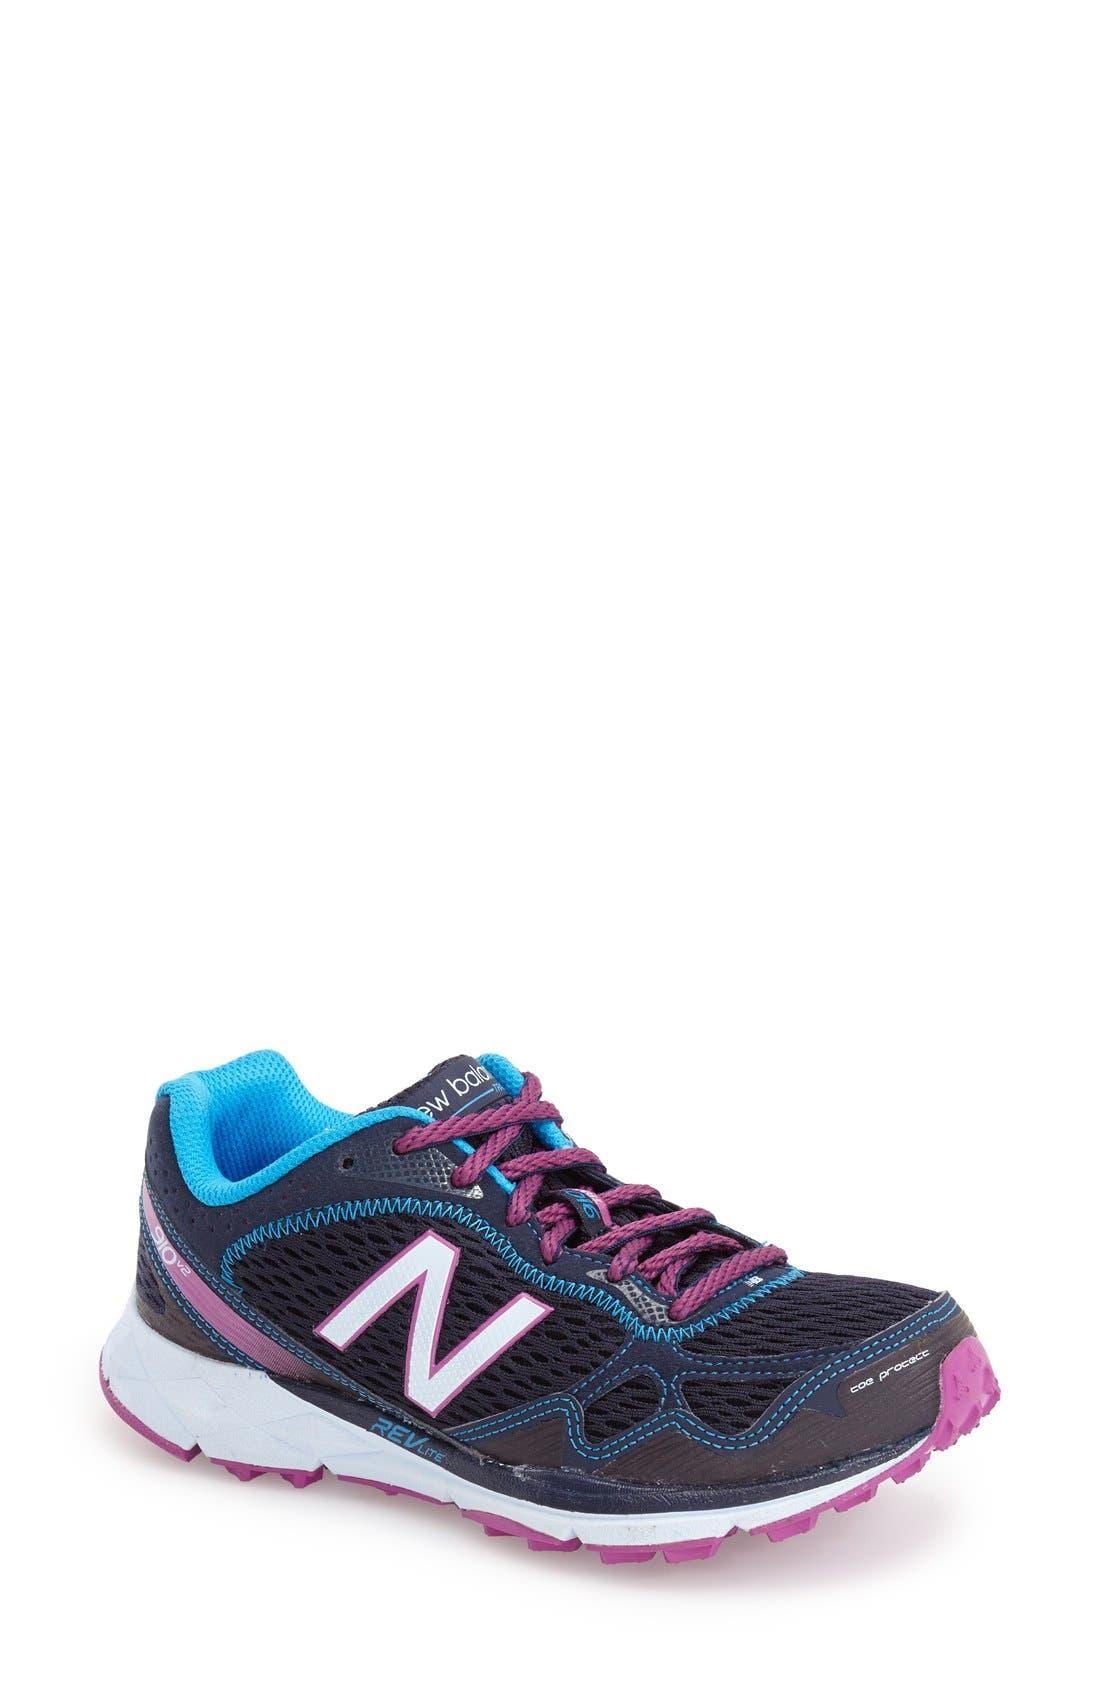 Main Image - New Balance '910' Trail Shoe (Women)